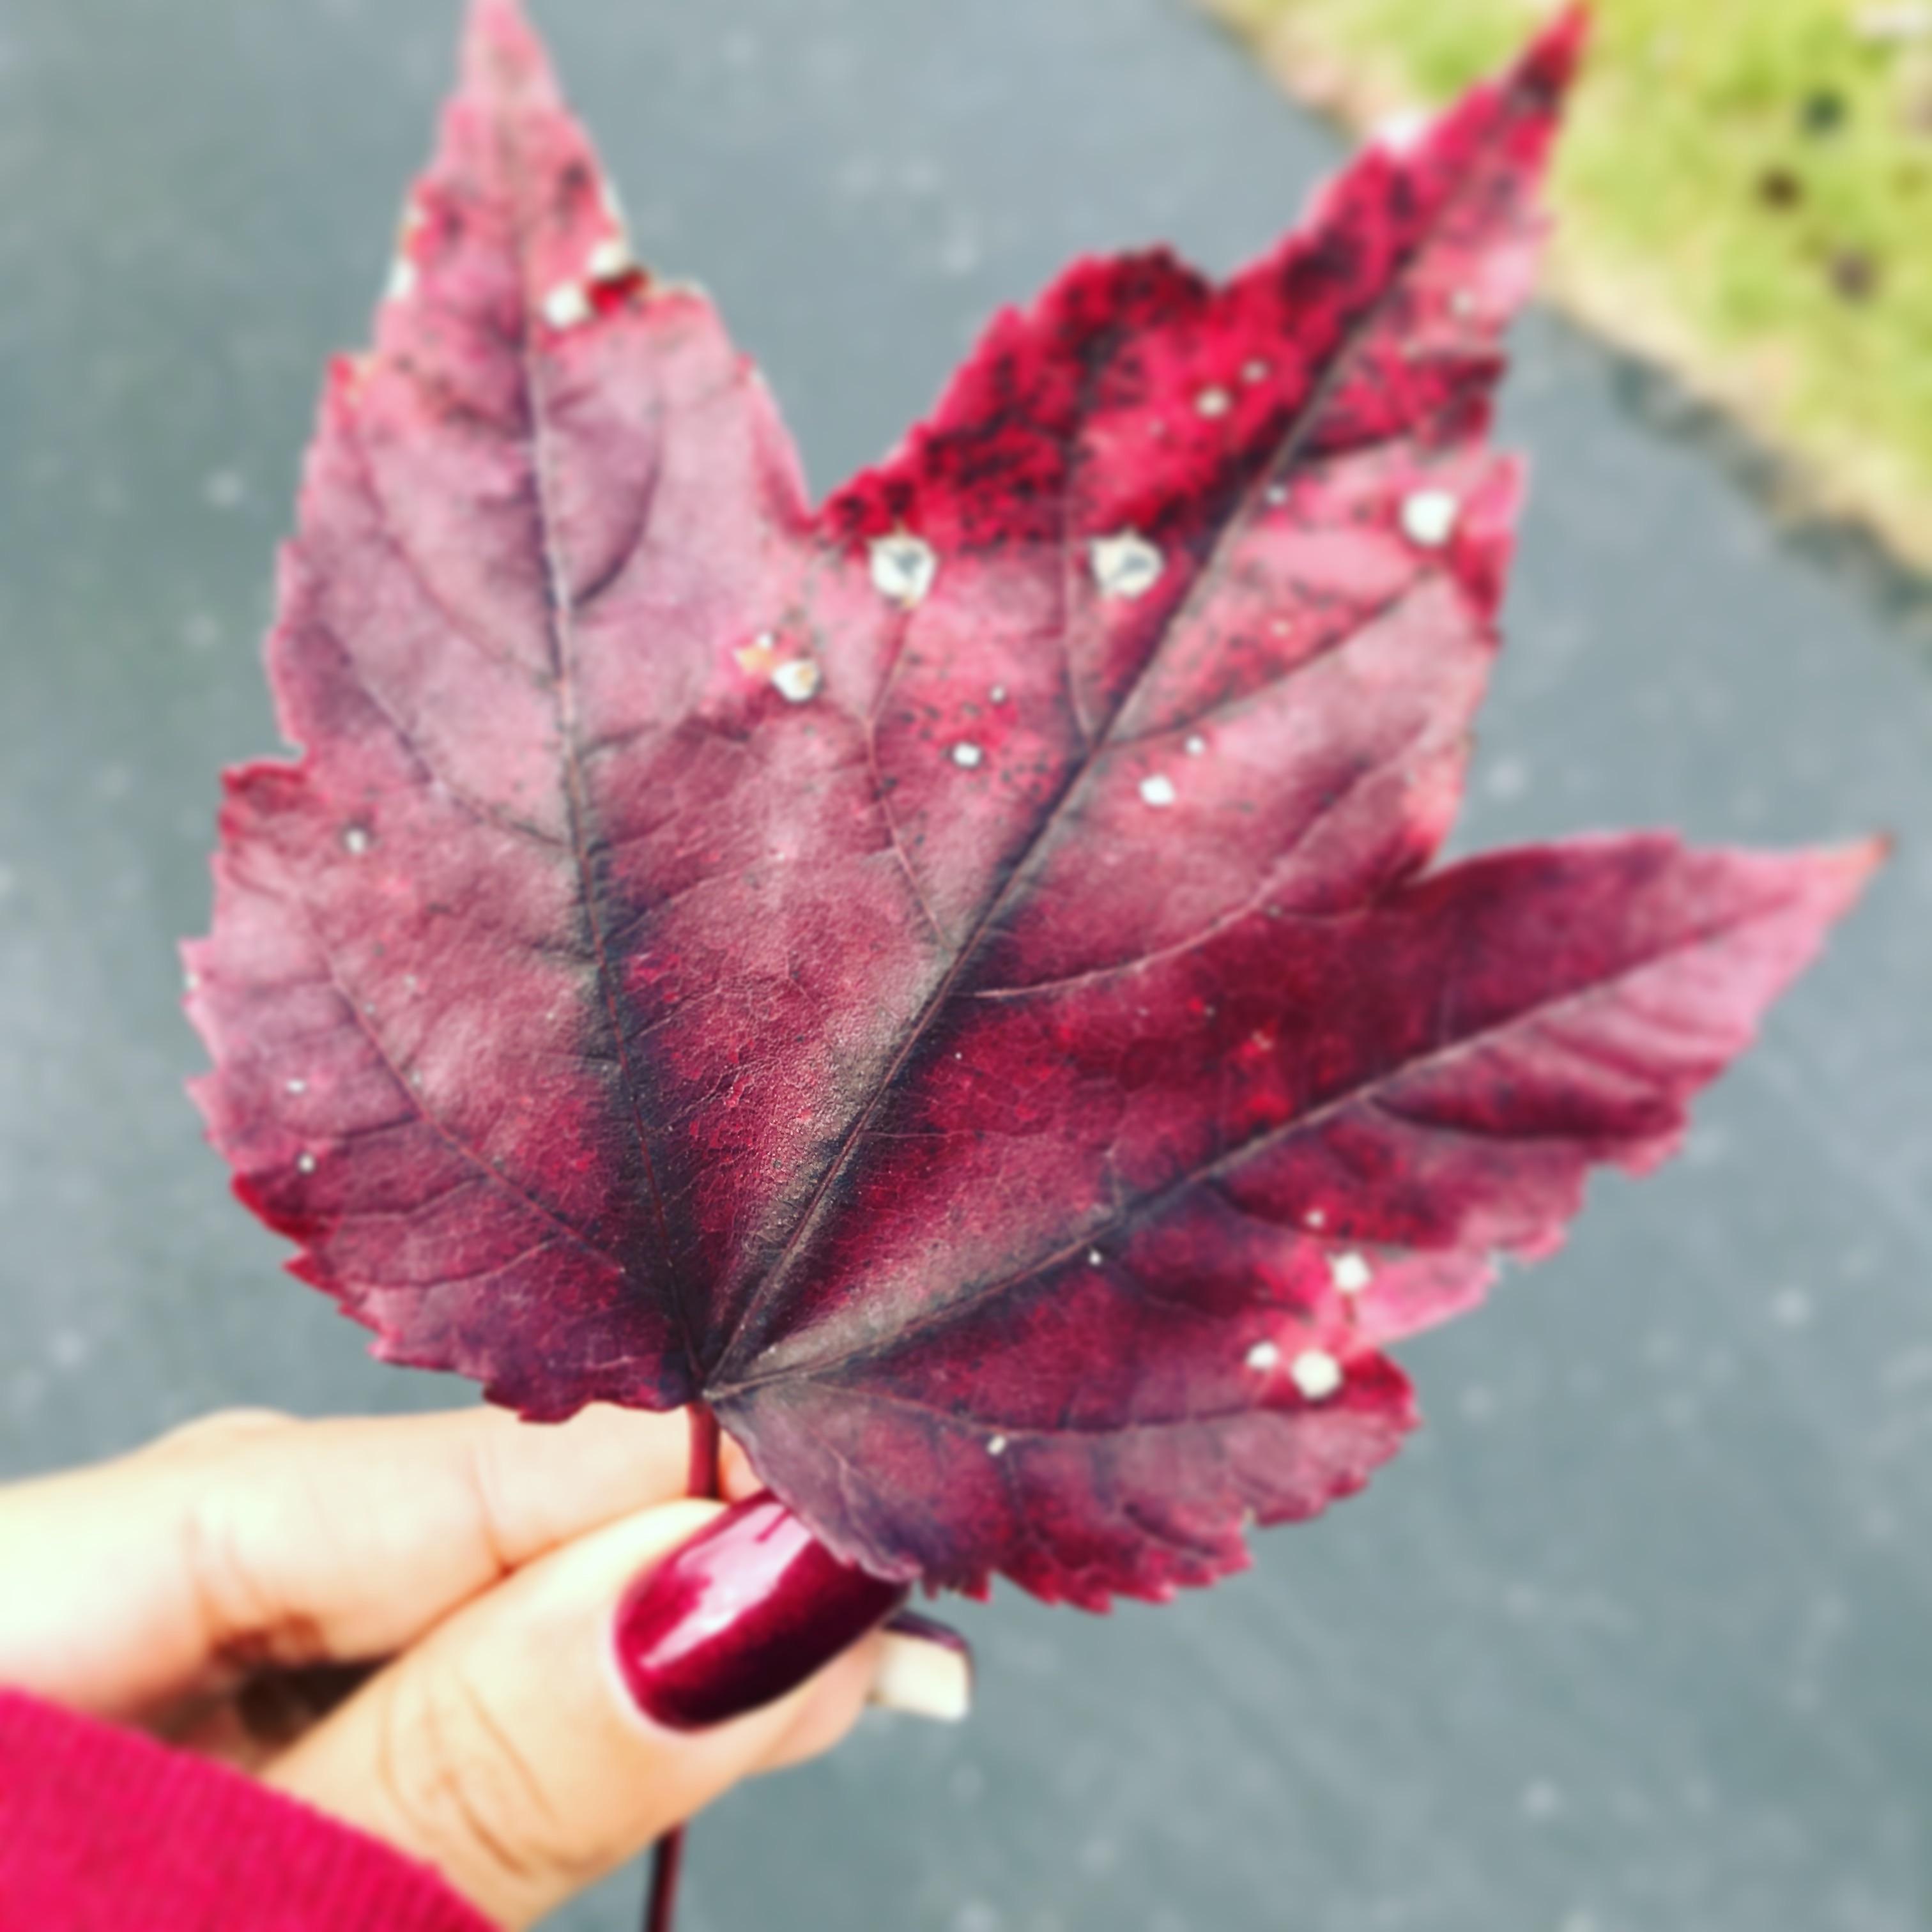 Free Images Branch Flower Petal Red Autumn Pink Season